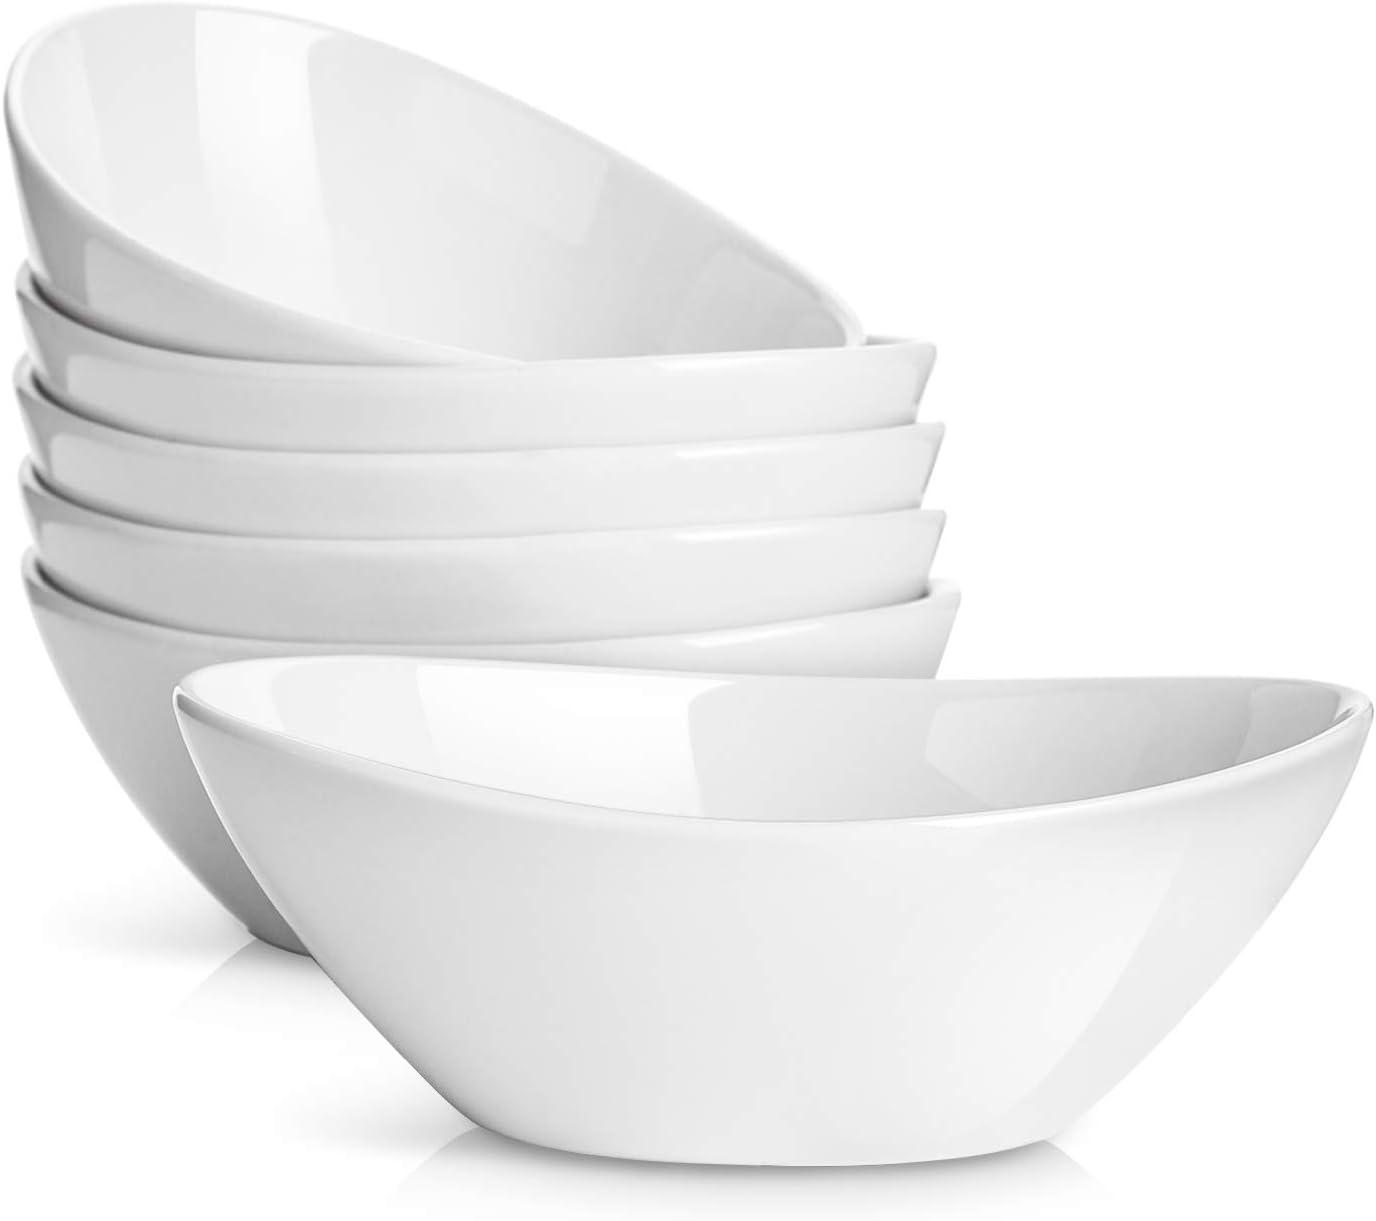 DOWAN Dessert Bowls, 16 Ounce Porcelain Bowls for Cereal, Pasta, Salad, Set of 6, White